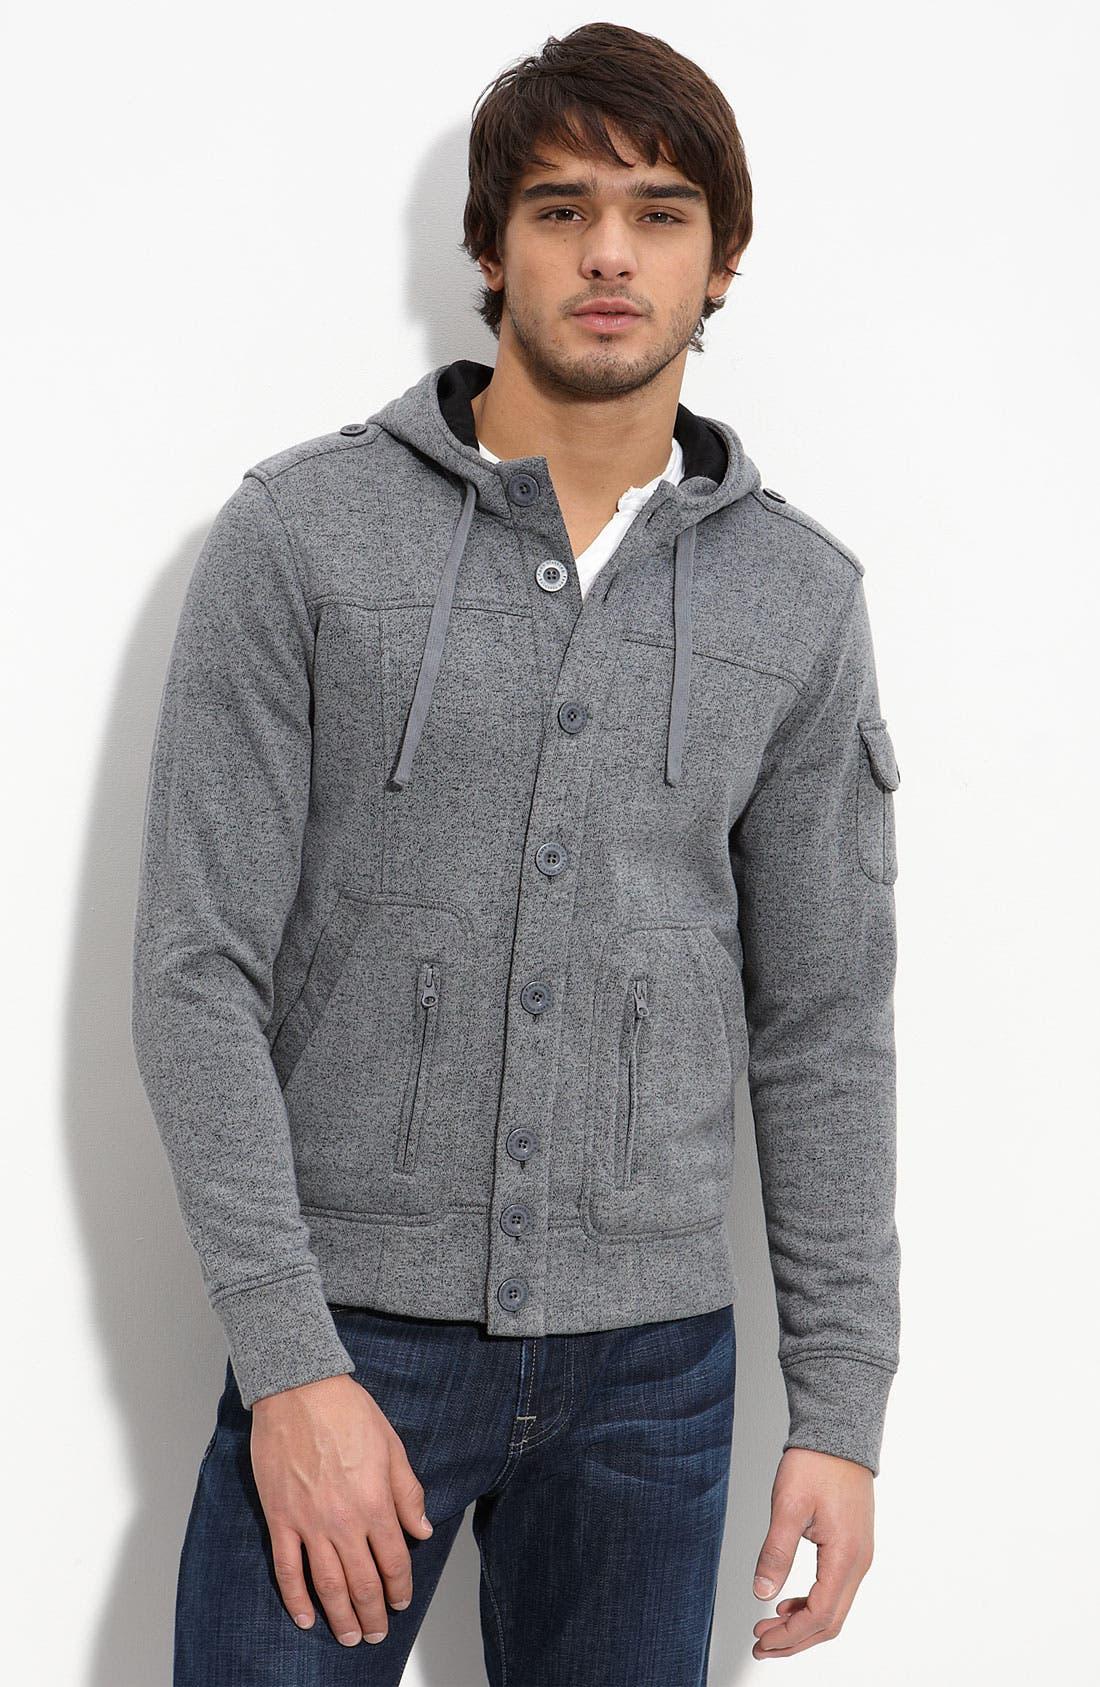 KAUN Hooded Fleece Jacket, Main, color, 010